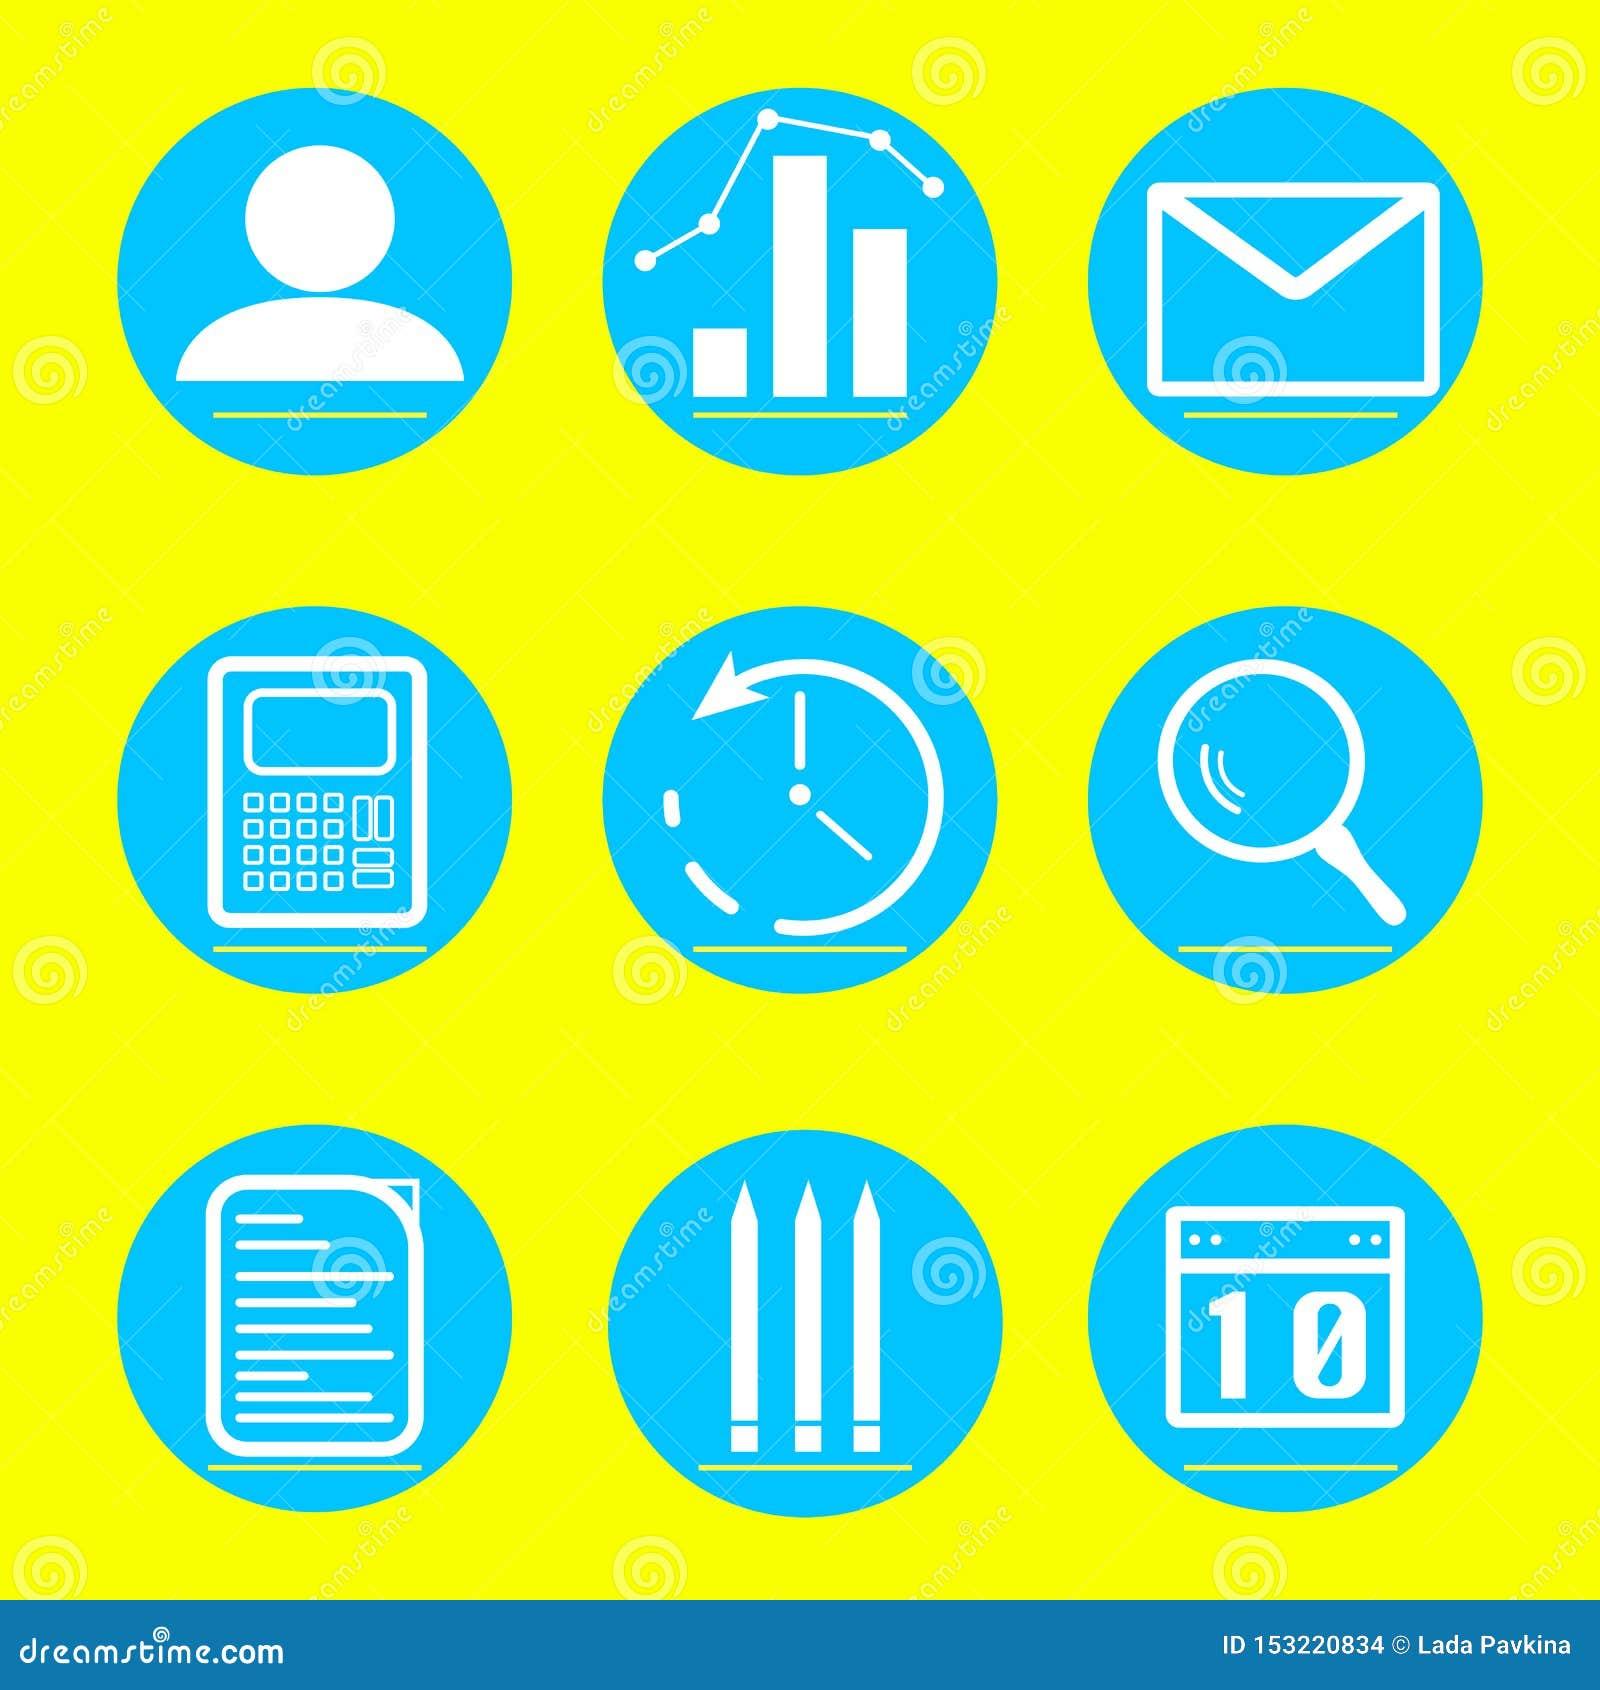 Ikona biznes i finanse ilustracja